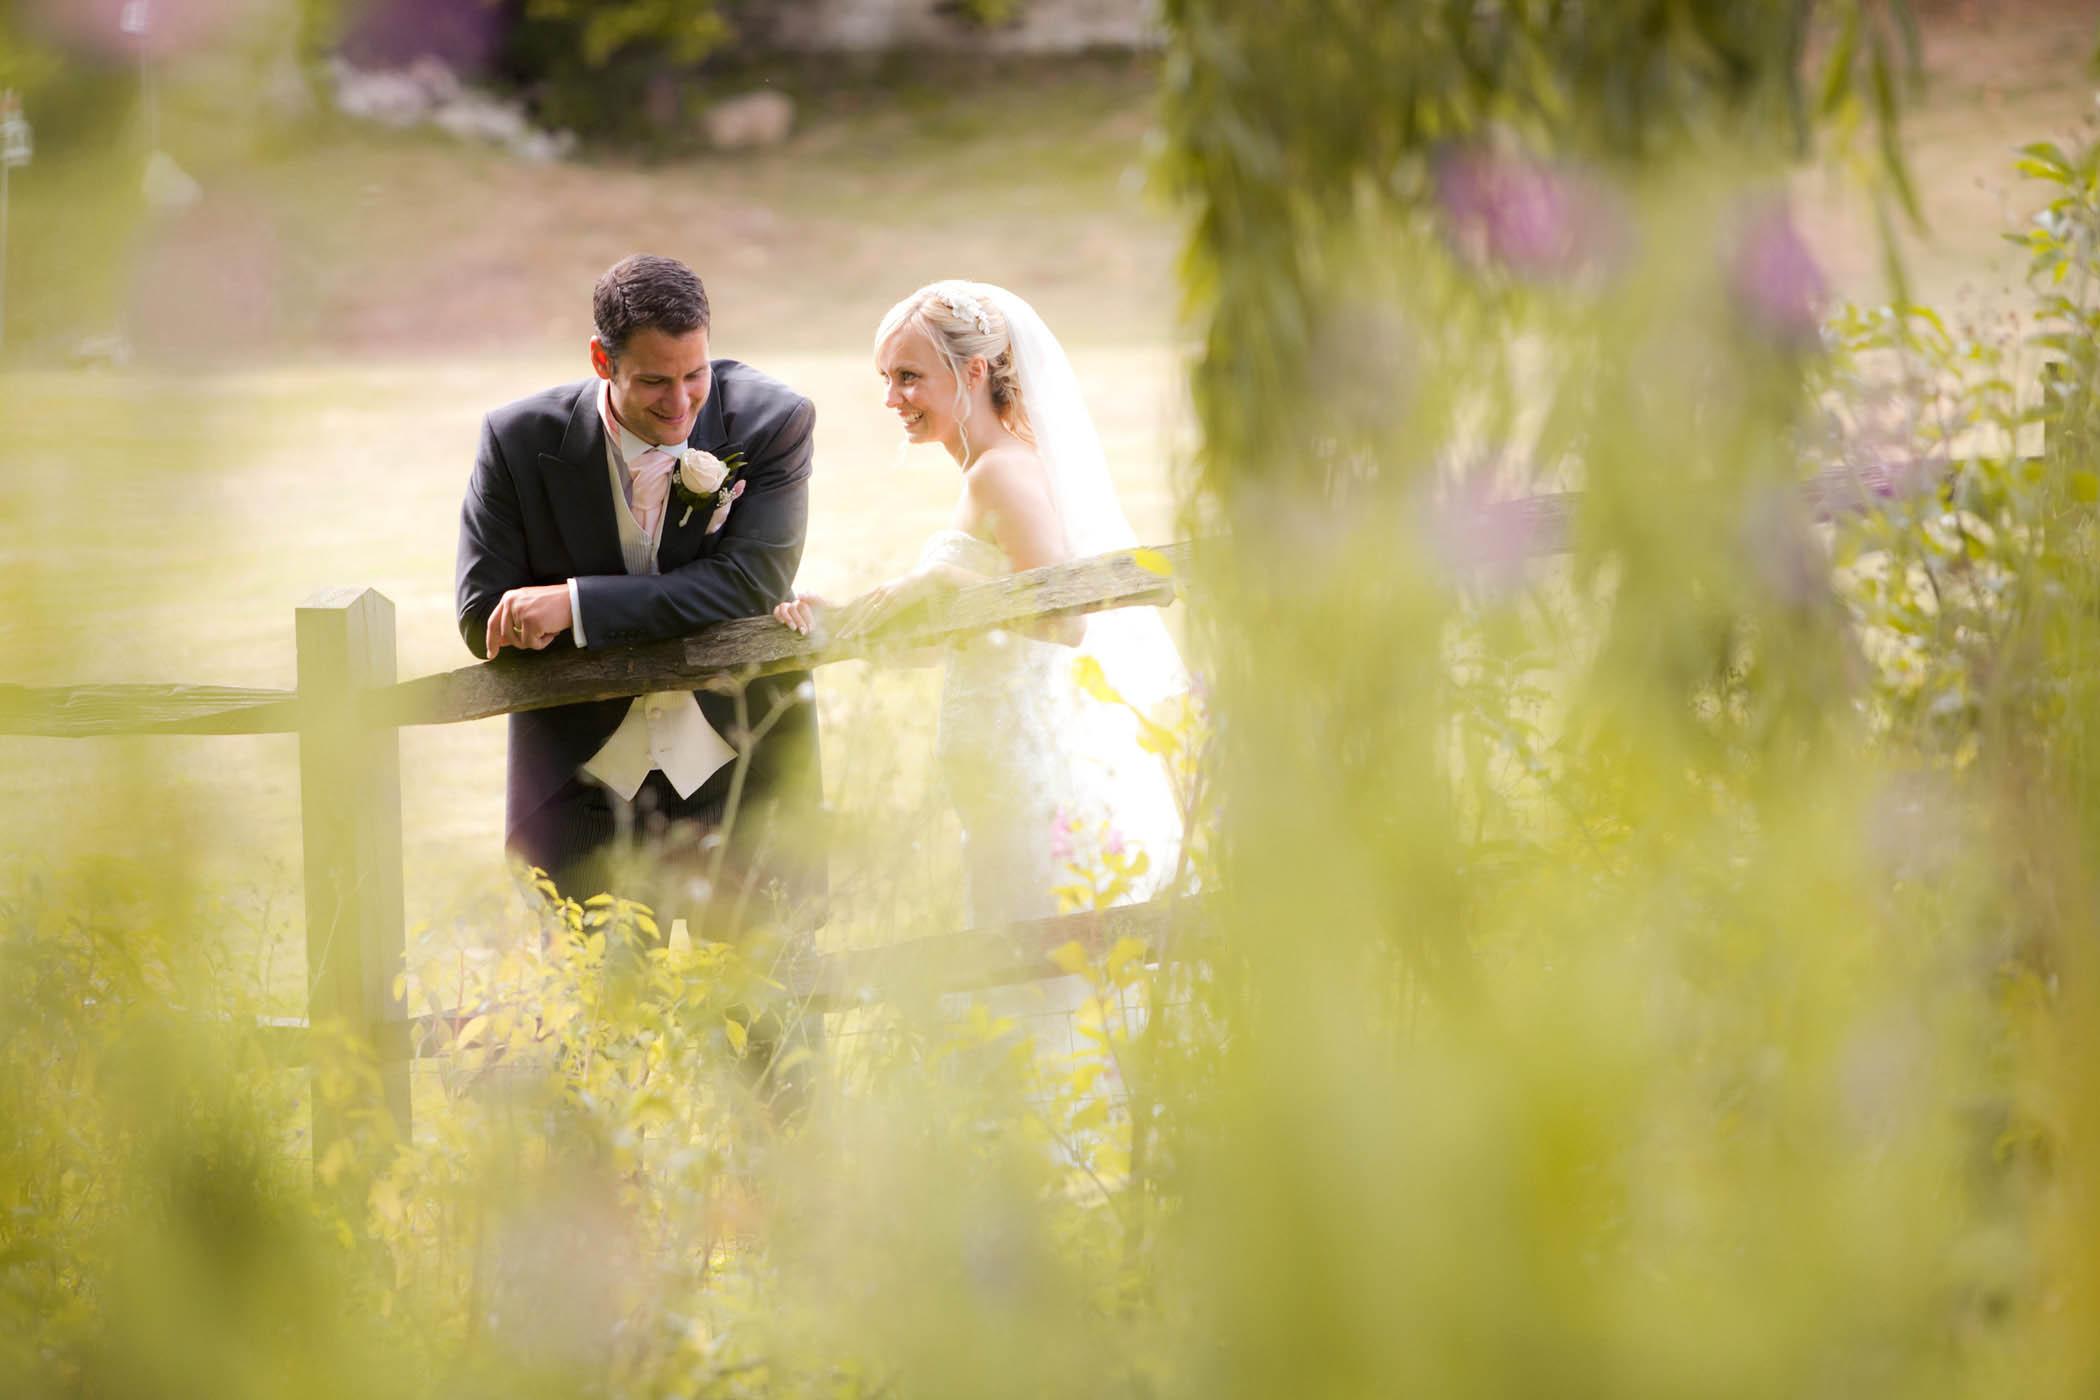 dan_burman_wedding_photography (7).jpg